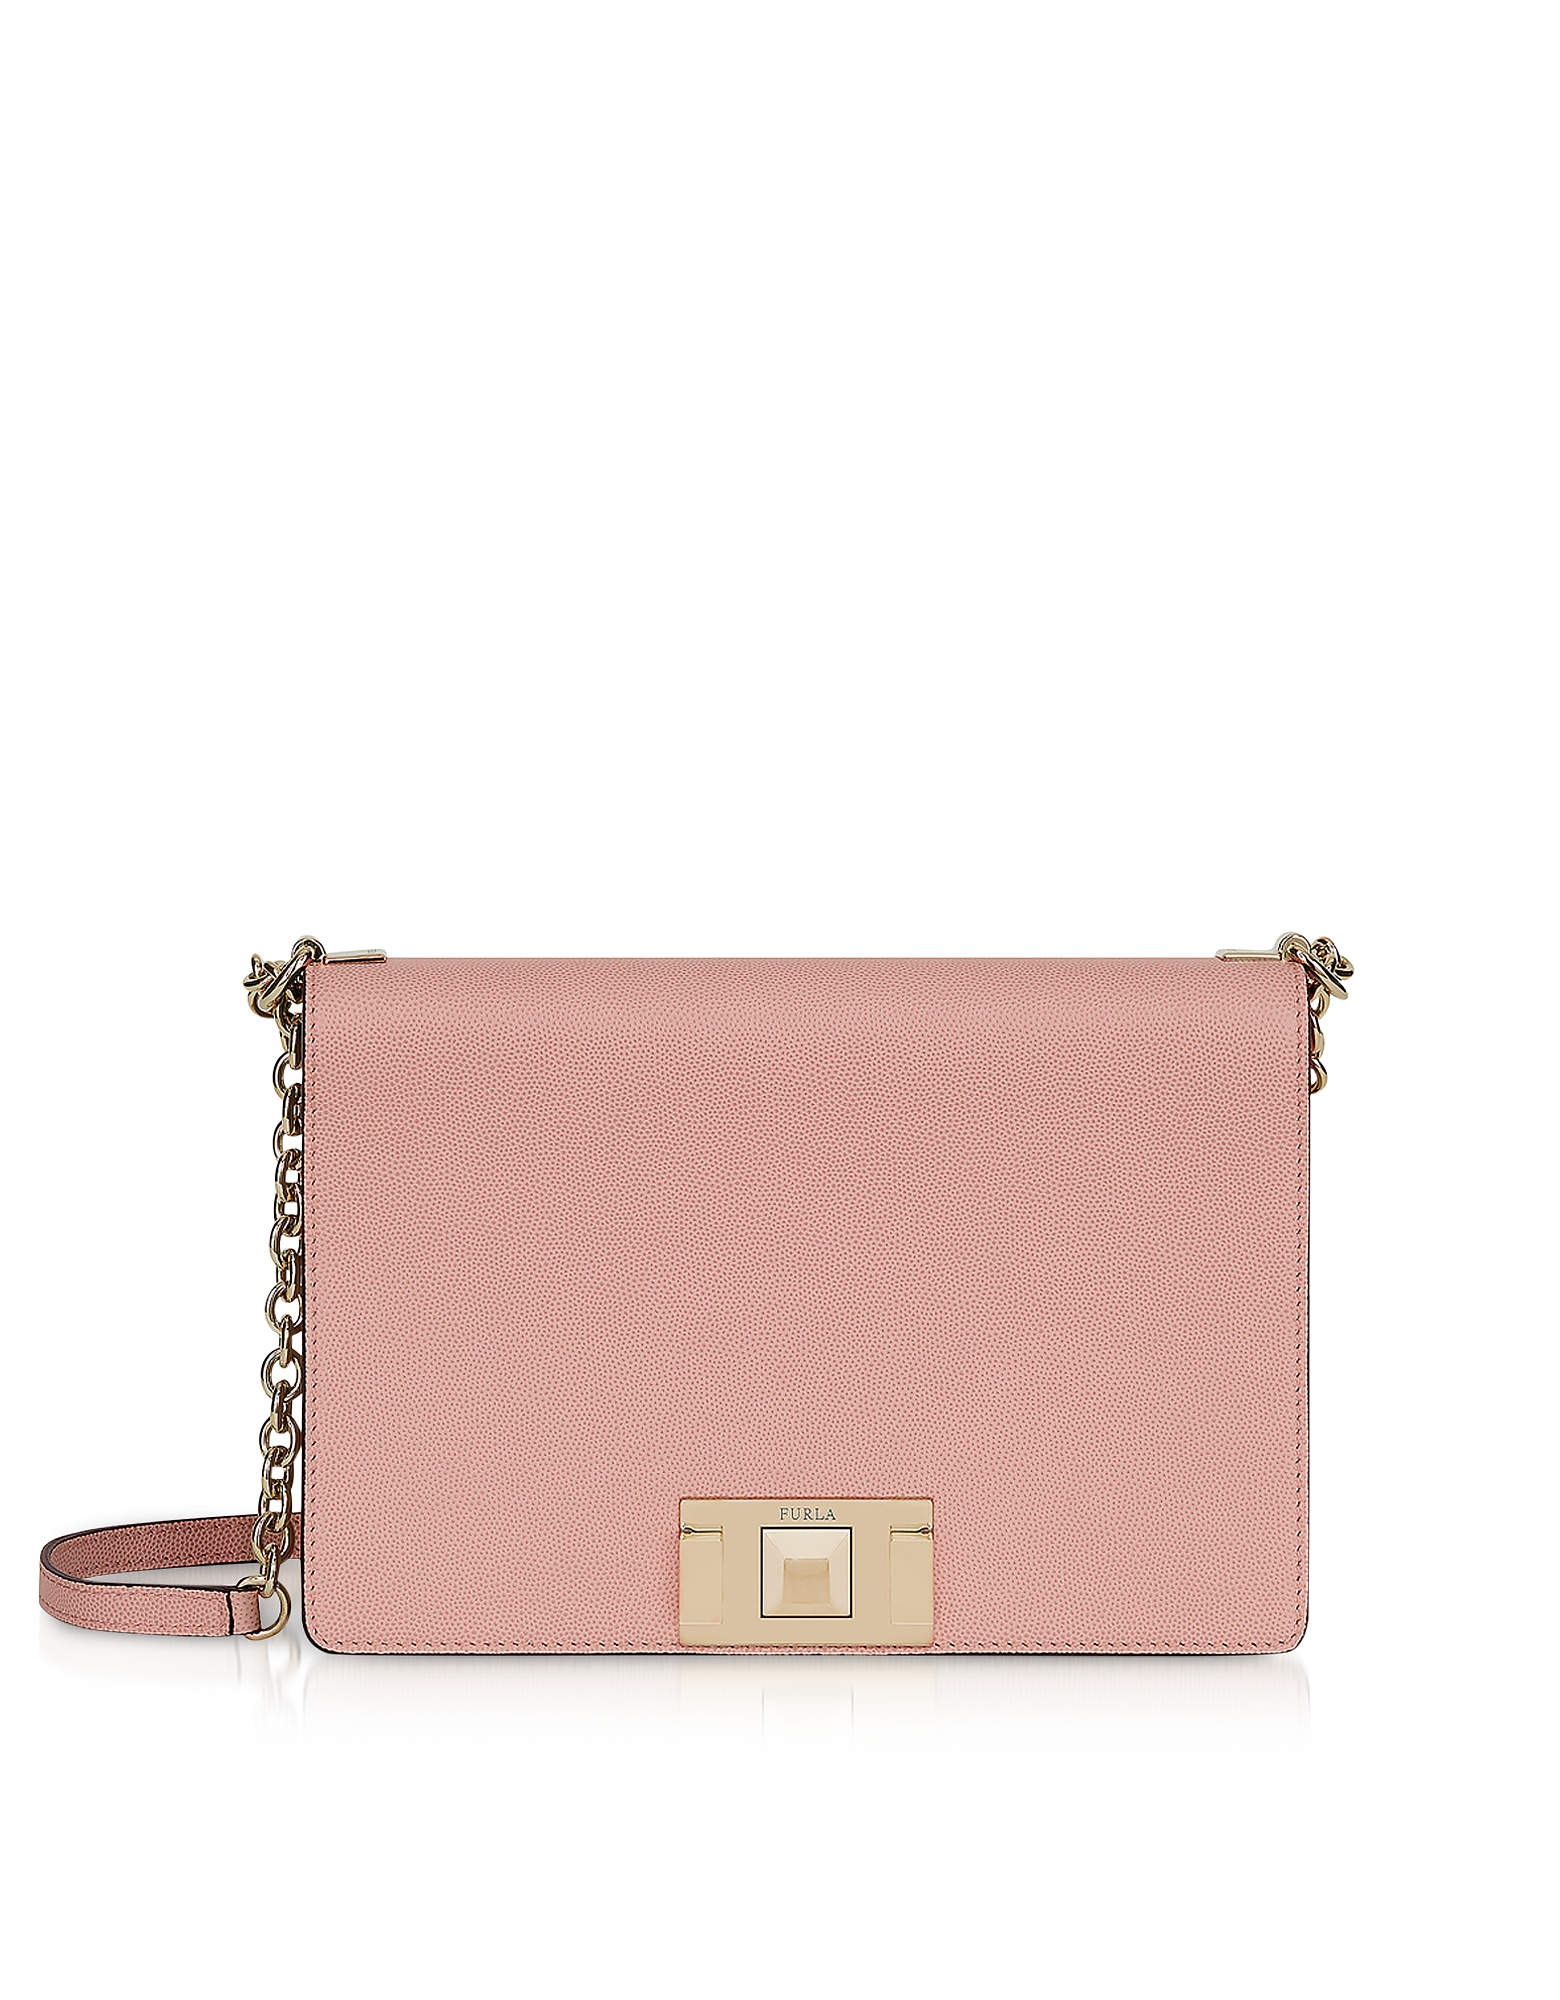 Furla Designer Handbags, Leather Mimì S Crossbody Bag